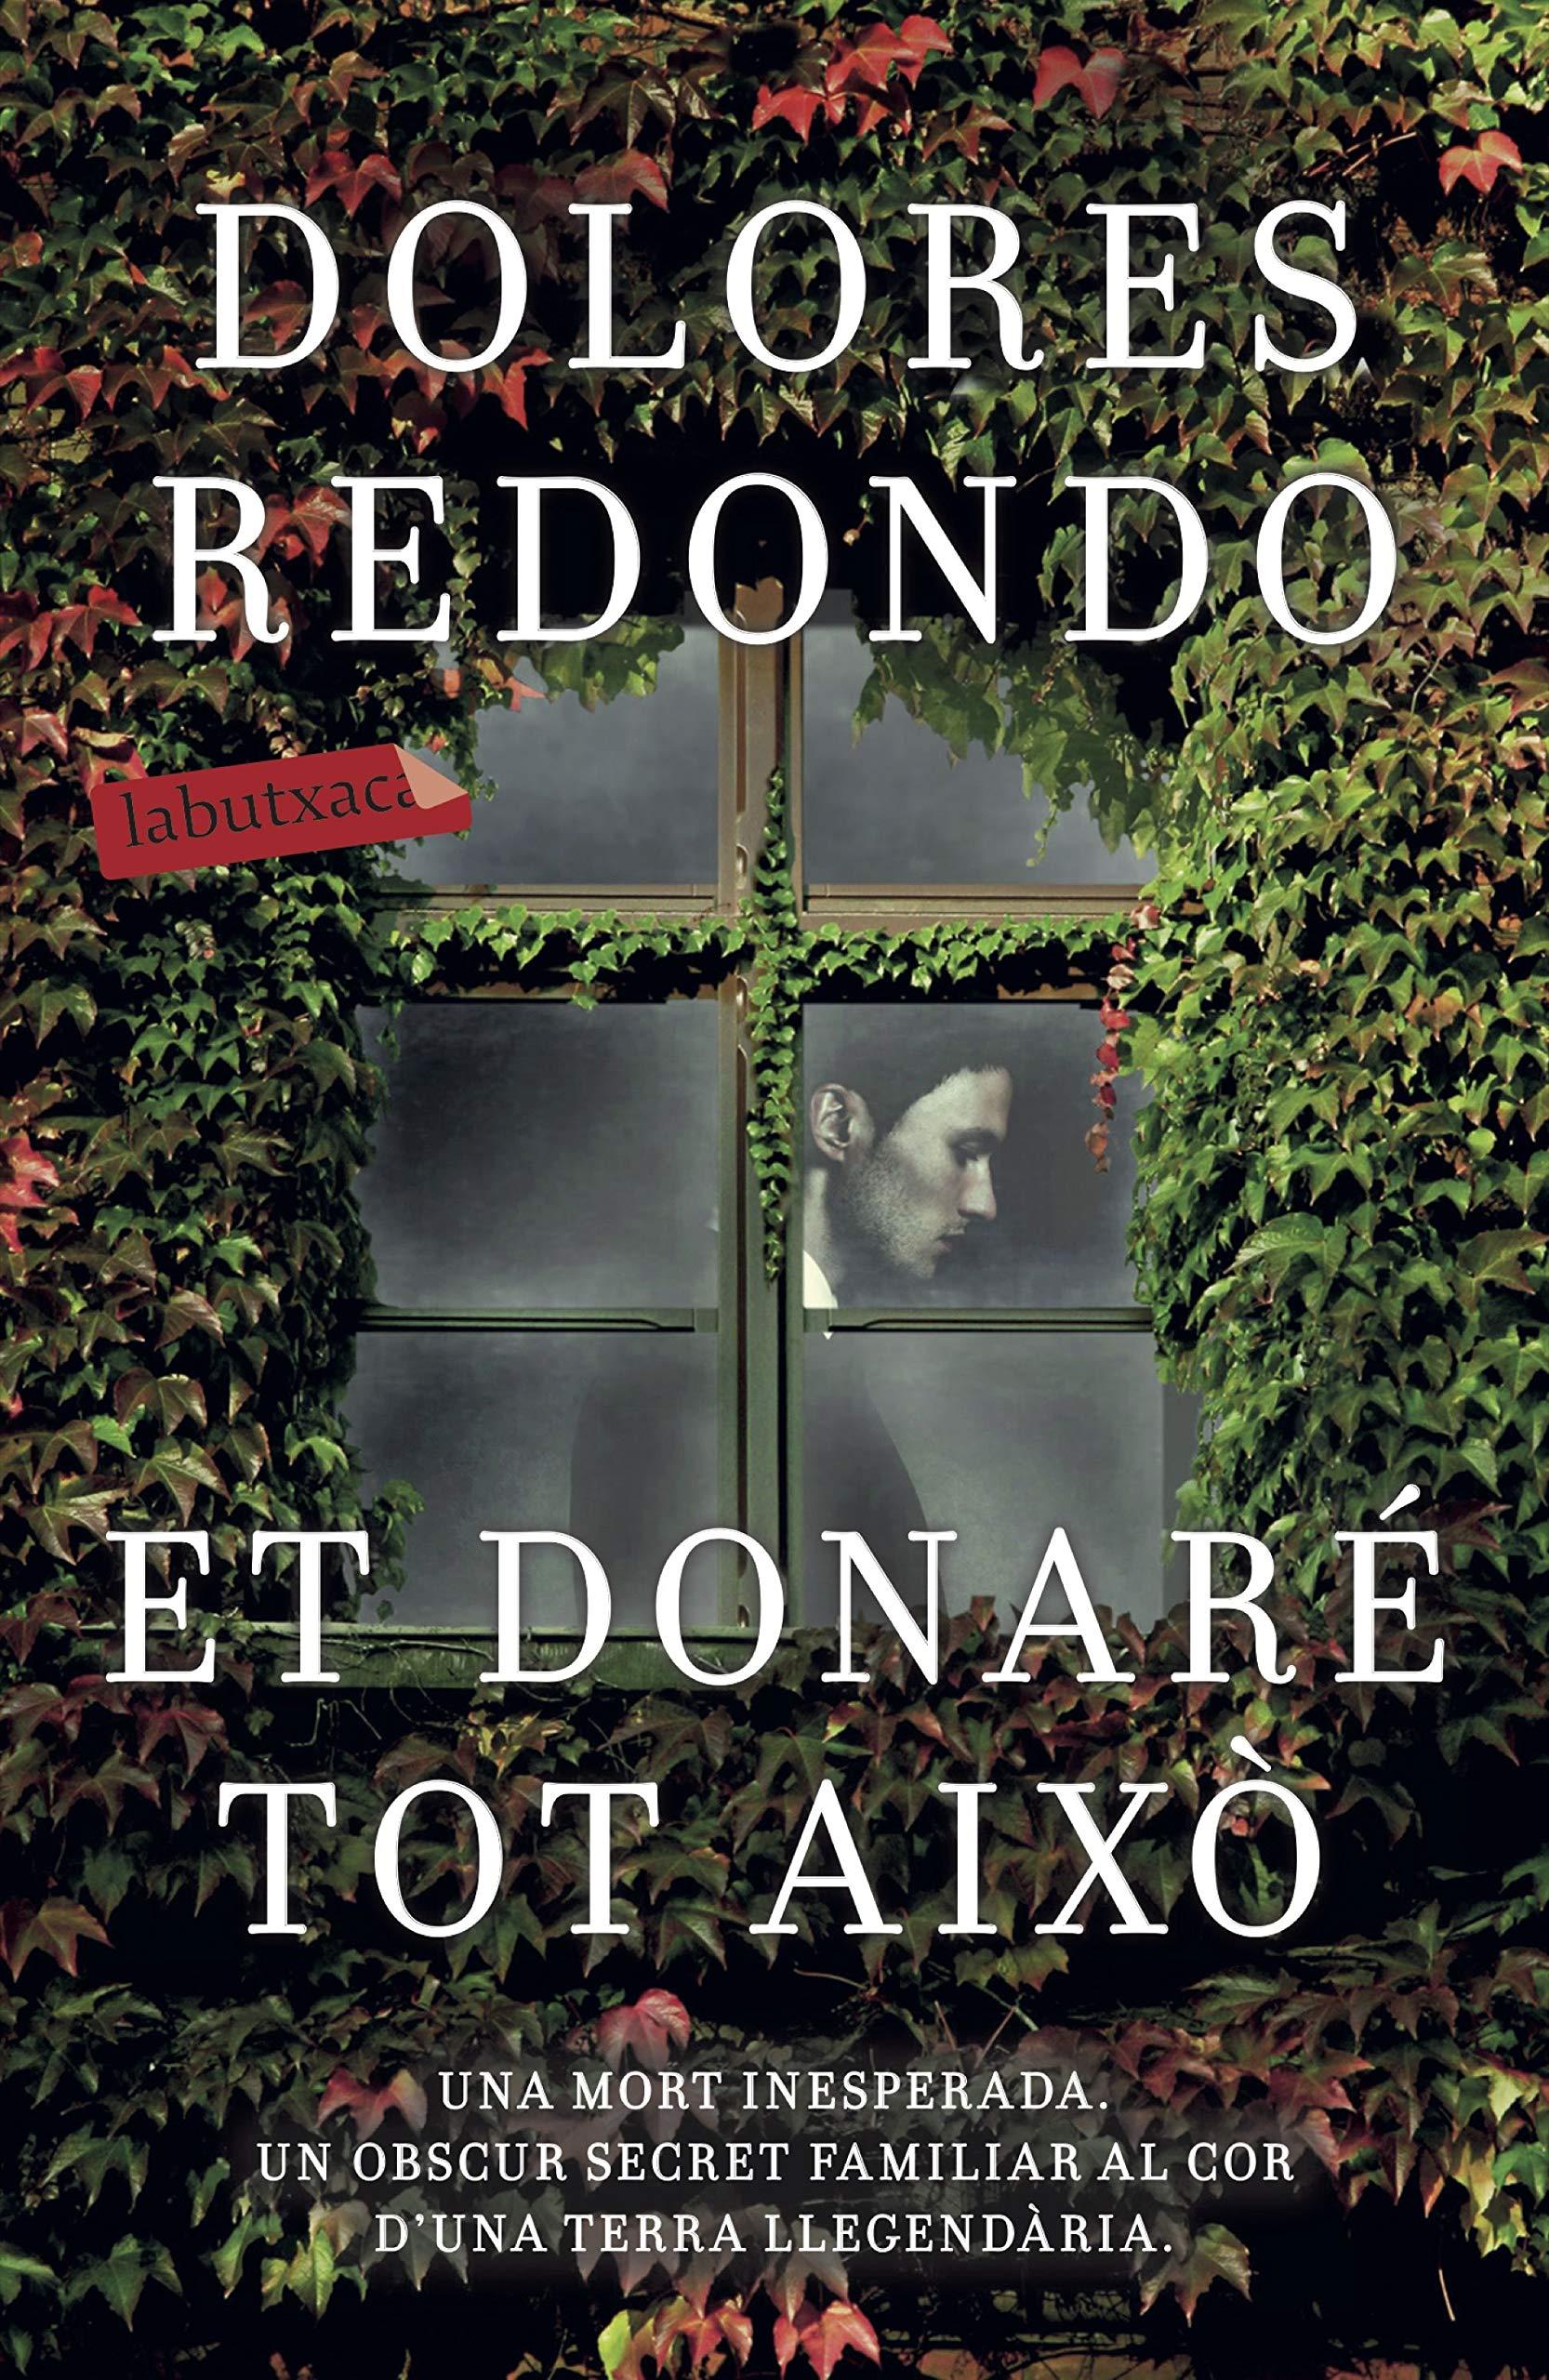 Et donaré tot això (LABUTXACA): Amazon.es: Dolores Redondo, Núria ...